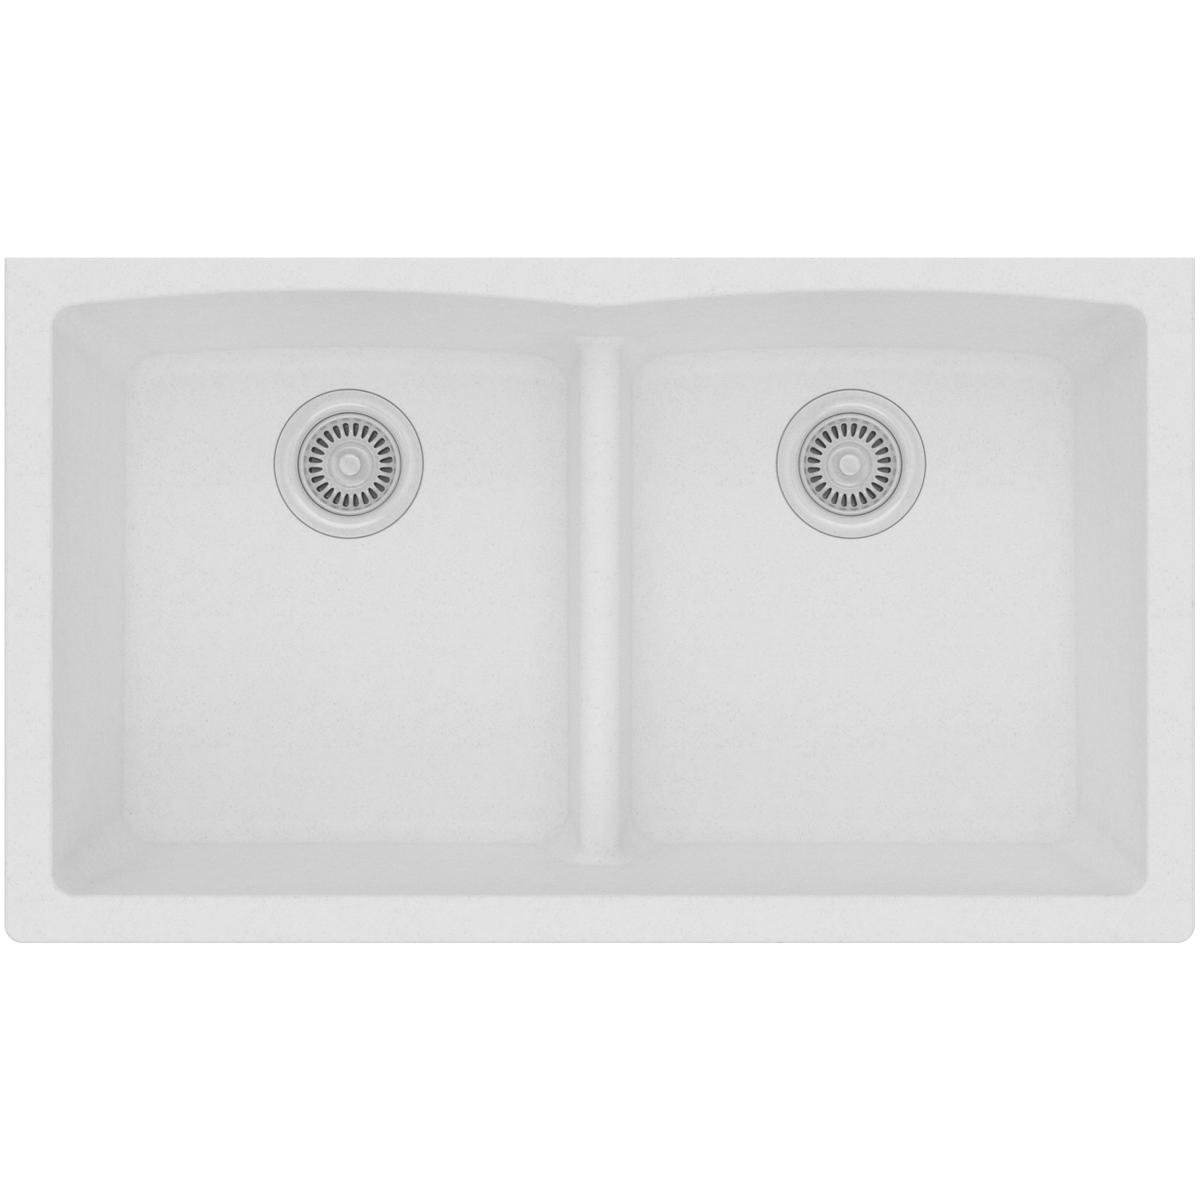 Elkay Quartz Classic ELGDULB3322WH0 White Equal Double Bowl Undermount Sink